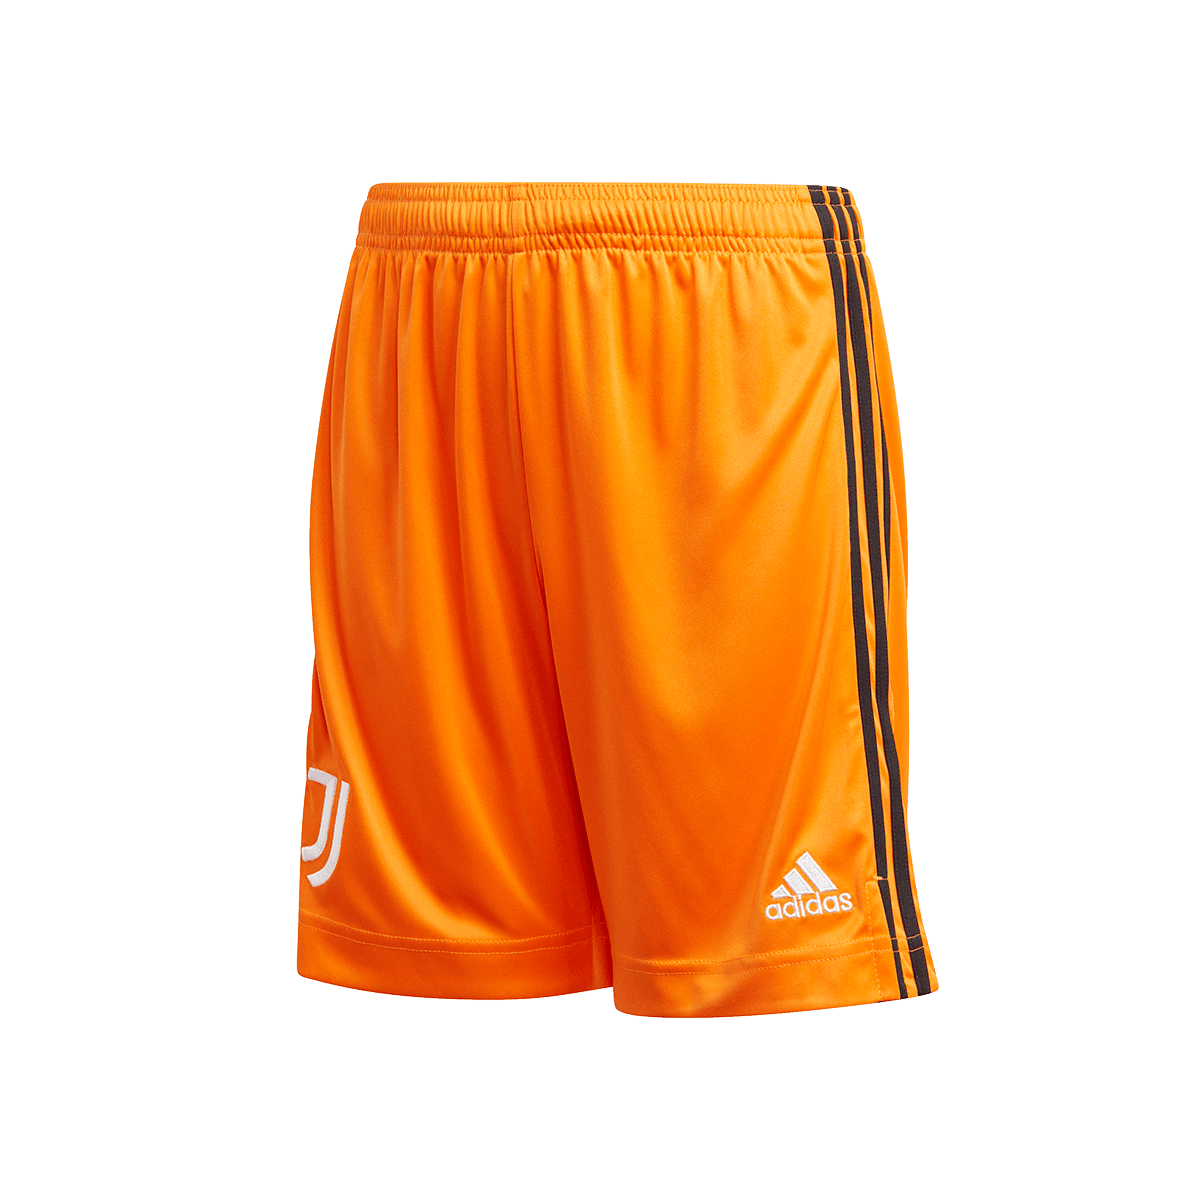 adidas Juventus Turin Kinder 3rd Short 202021 orangeweiß